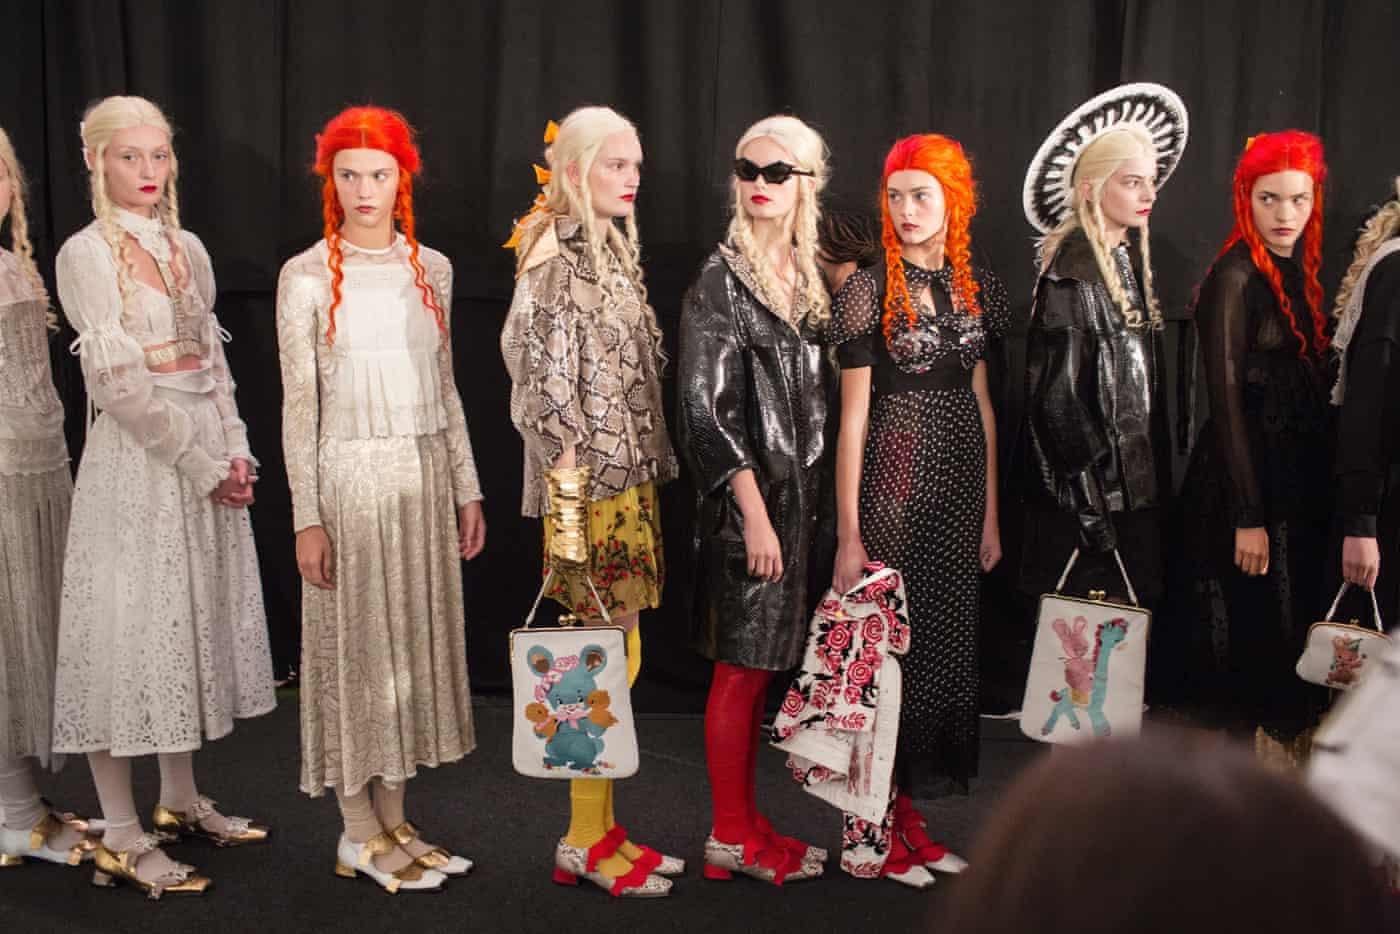 London fashion week spring summer 2014 live blog - day five